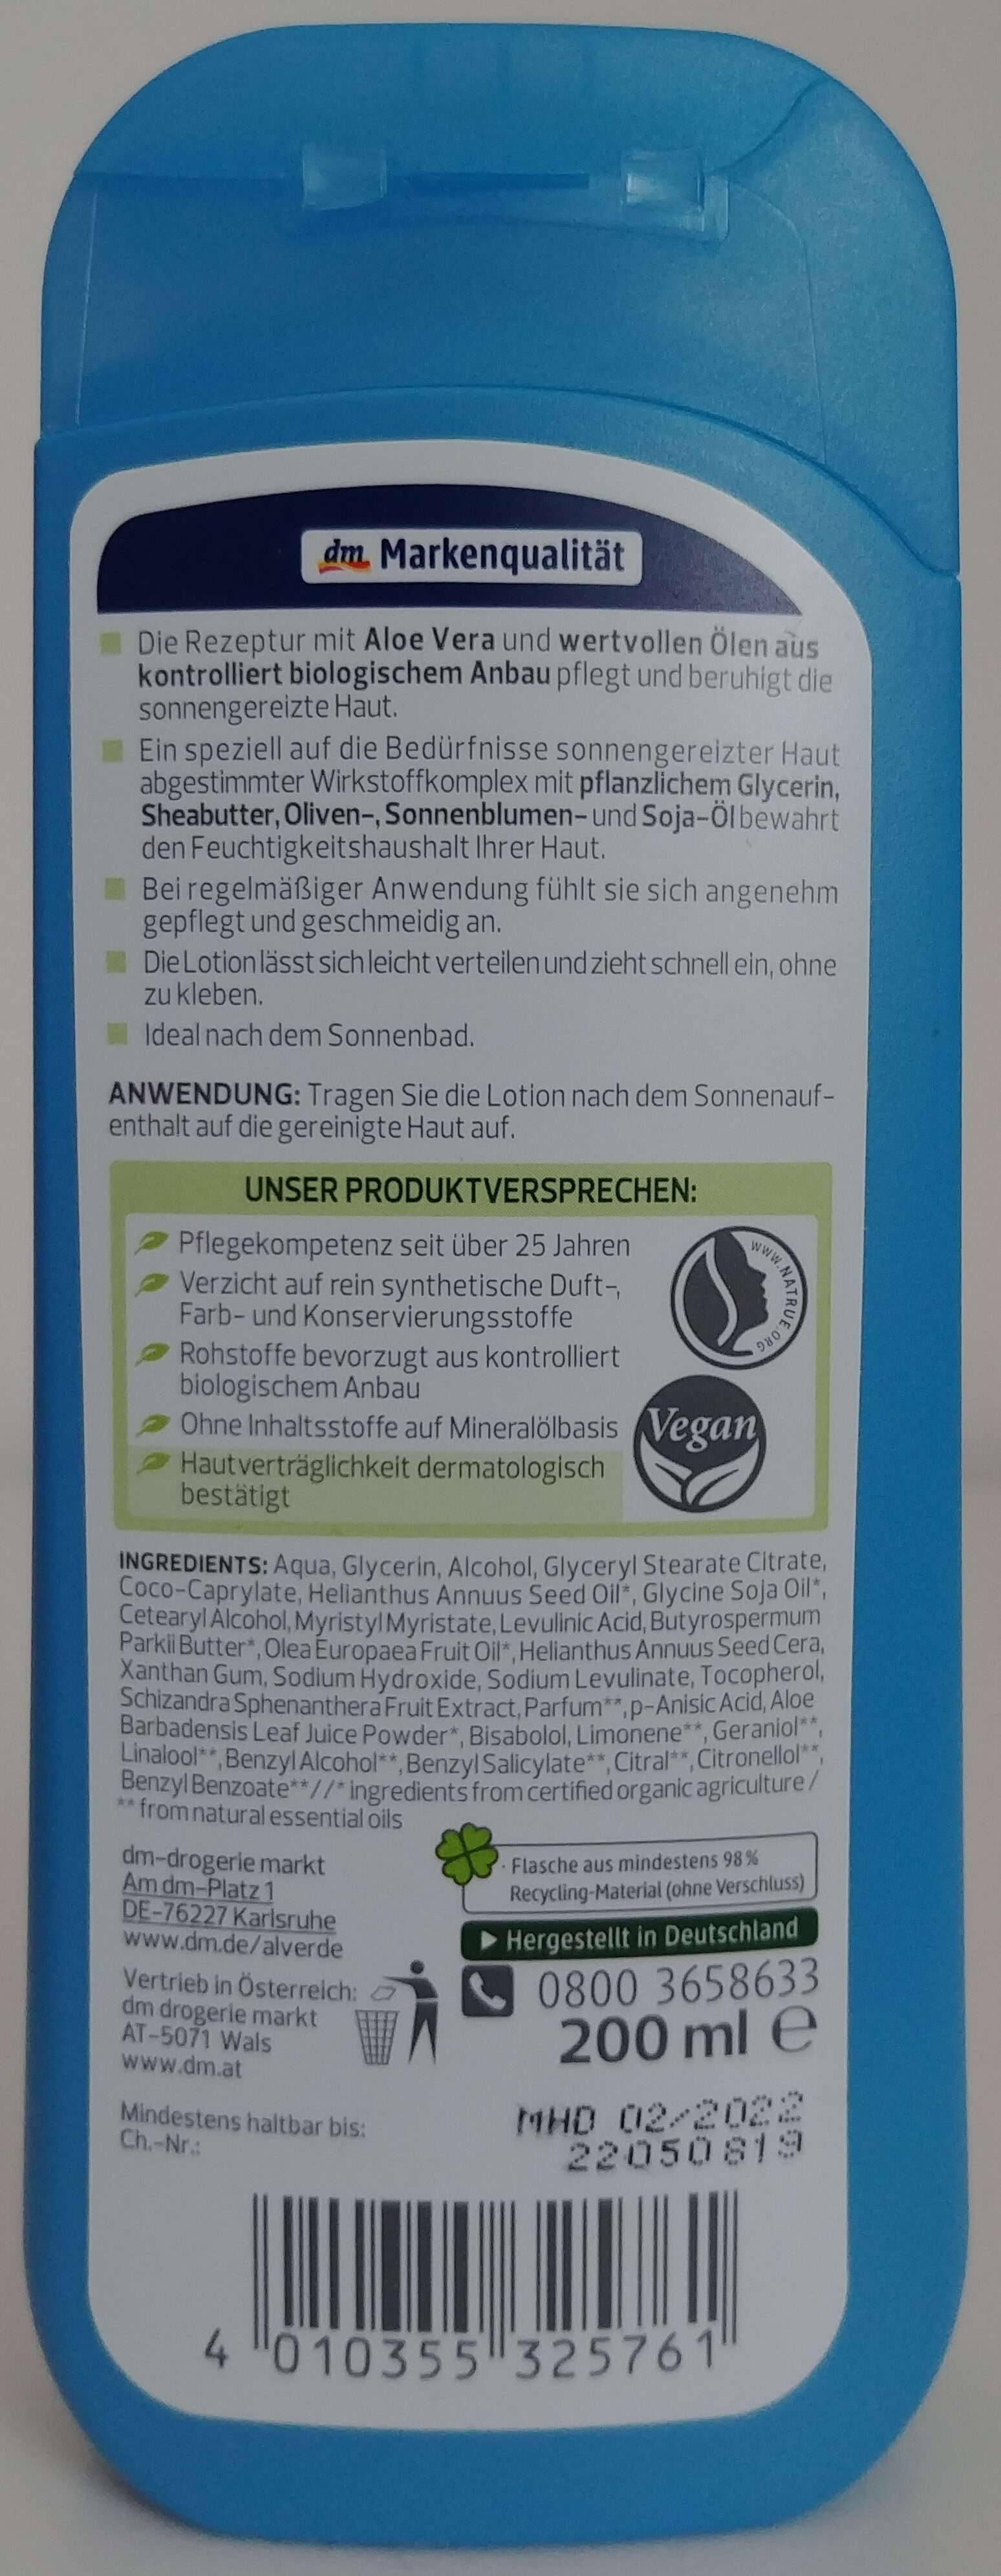 Après-Lotion Bio-Aloe Vera - Product - en